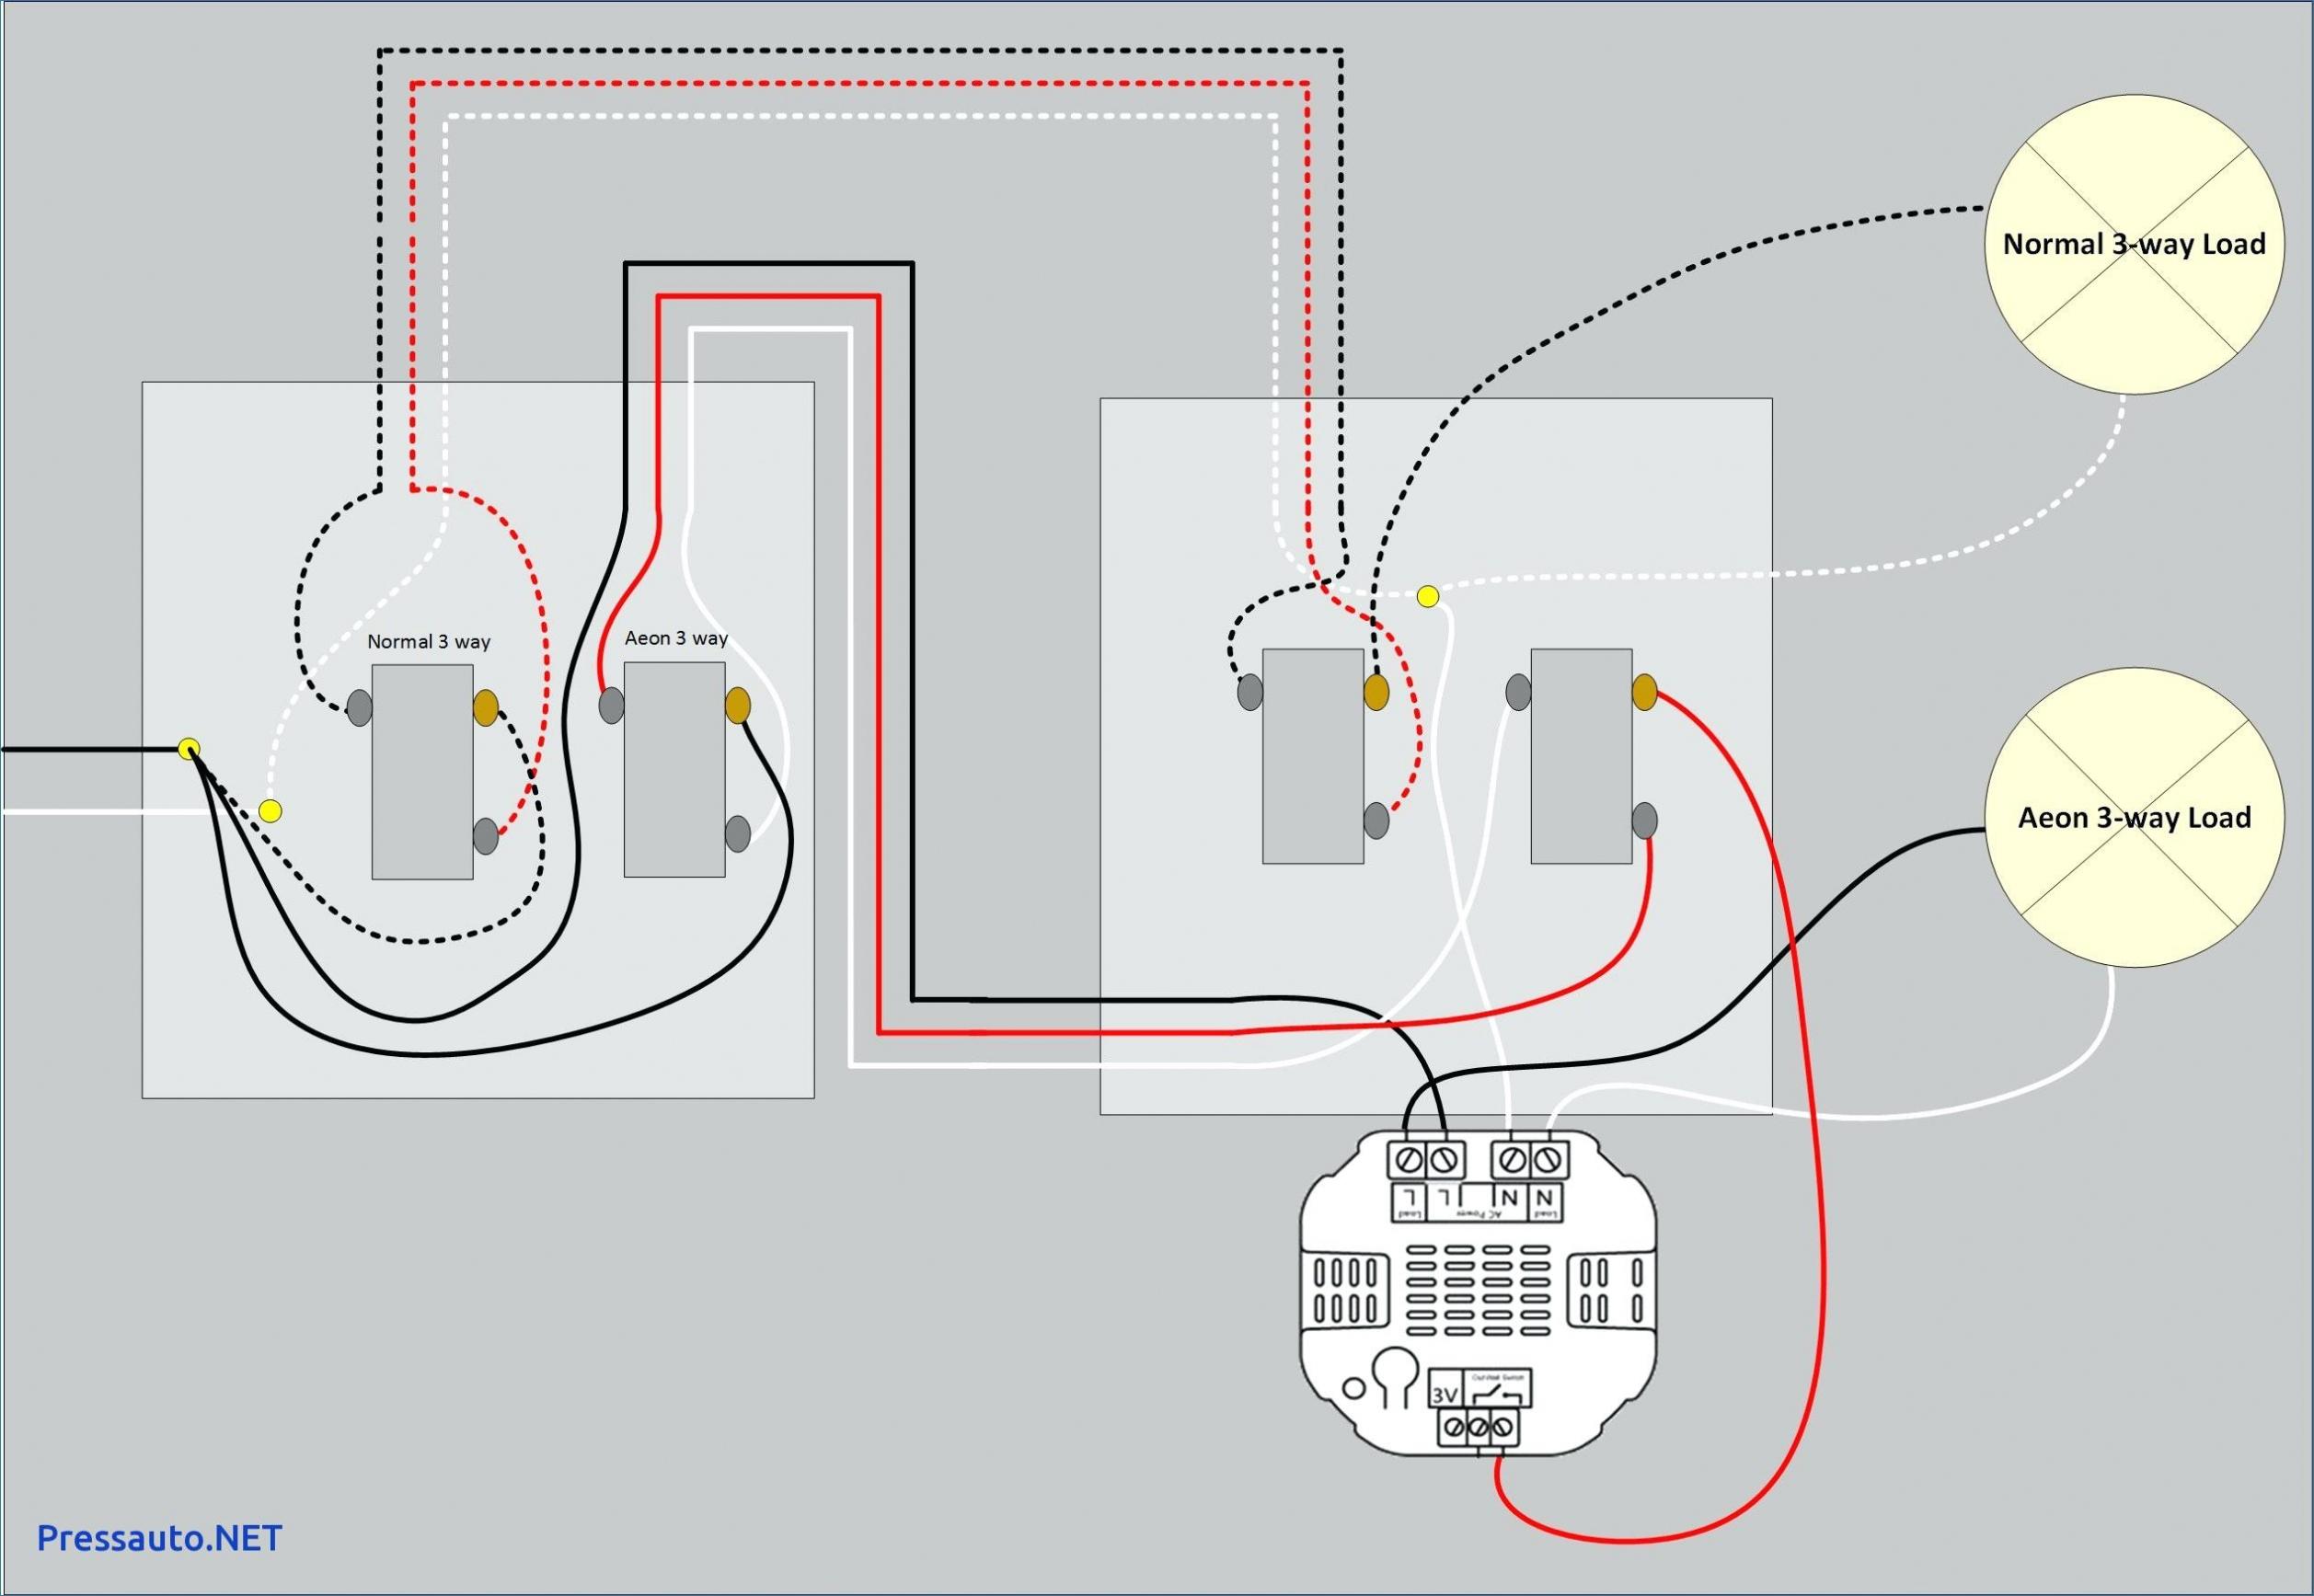 2 Way Switch Wiring Diagram Pdf – Perfect Electrical Two Way Switch - 3 Way Switch Wiring Diagram Pdf